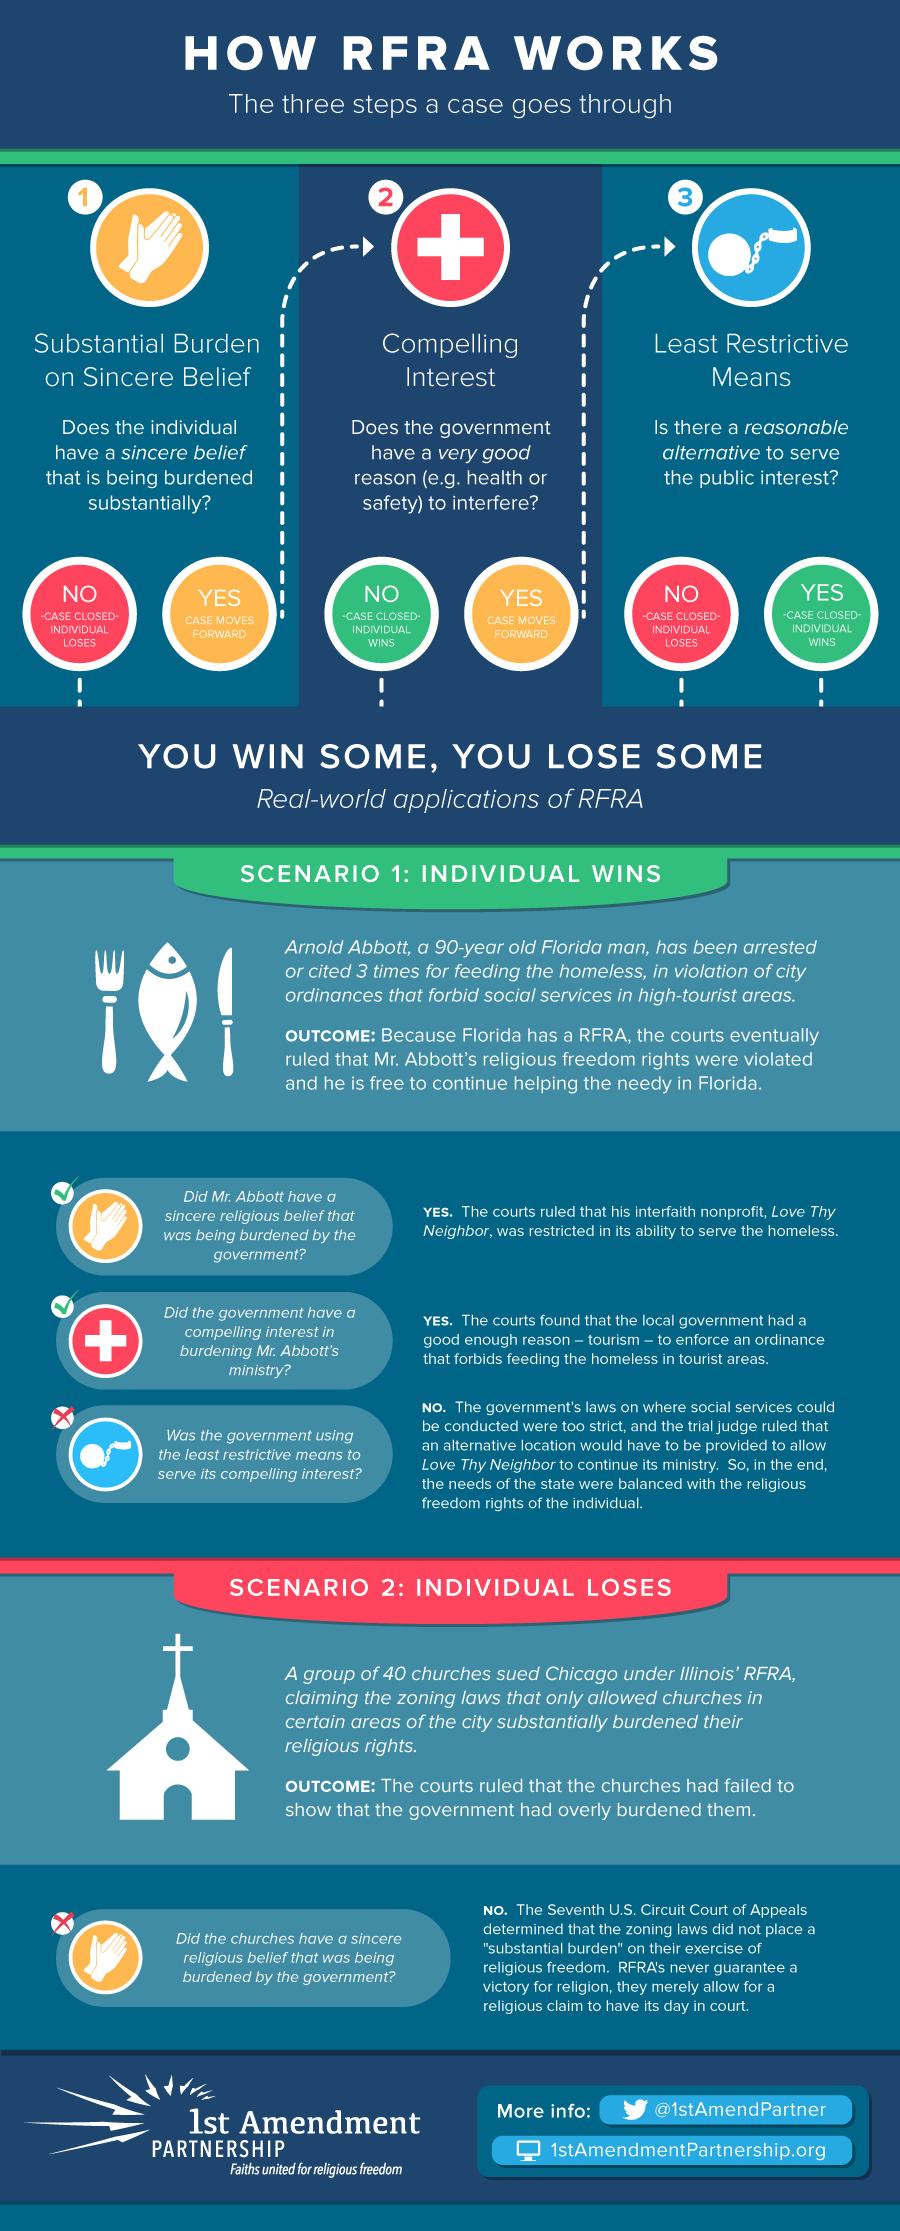 RFRA Infographic